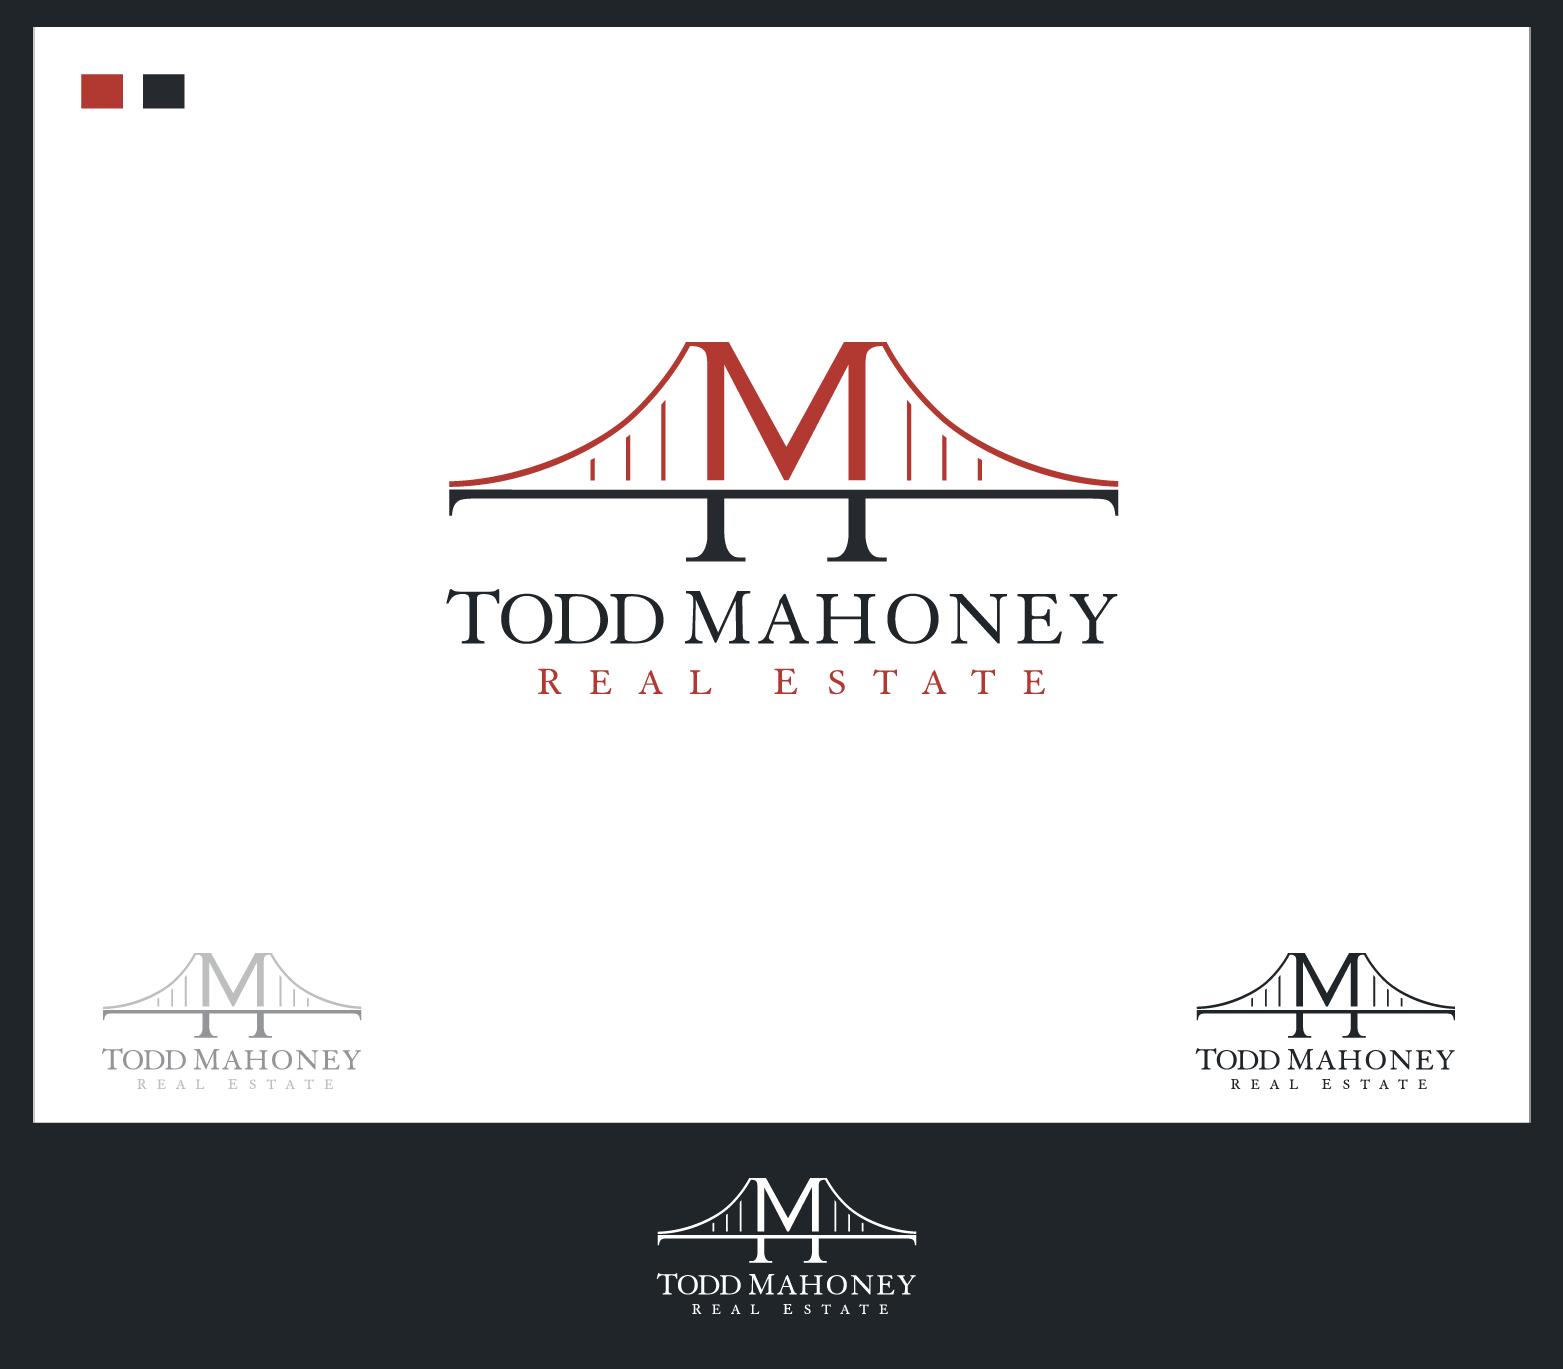 Todd Mahoney Real Estate